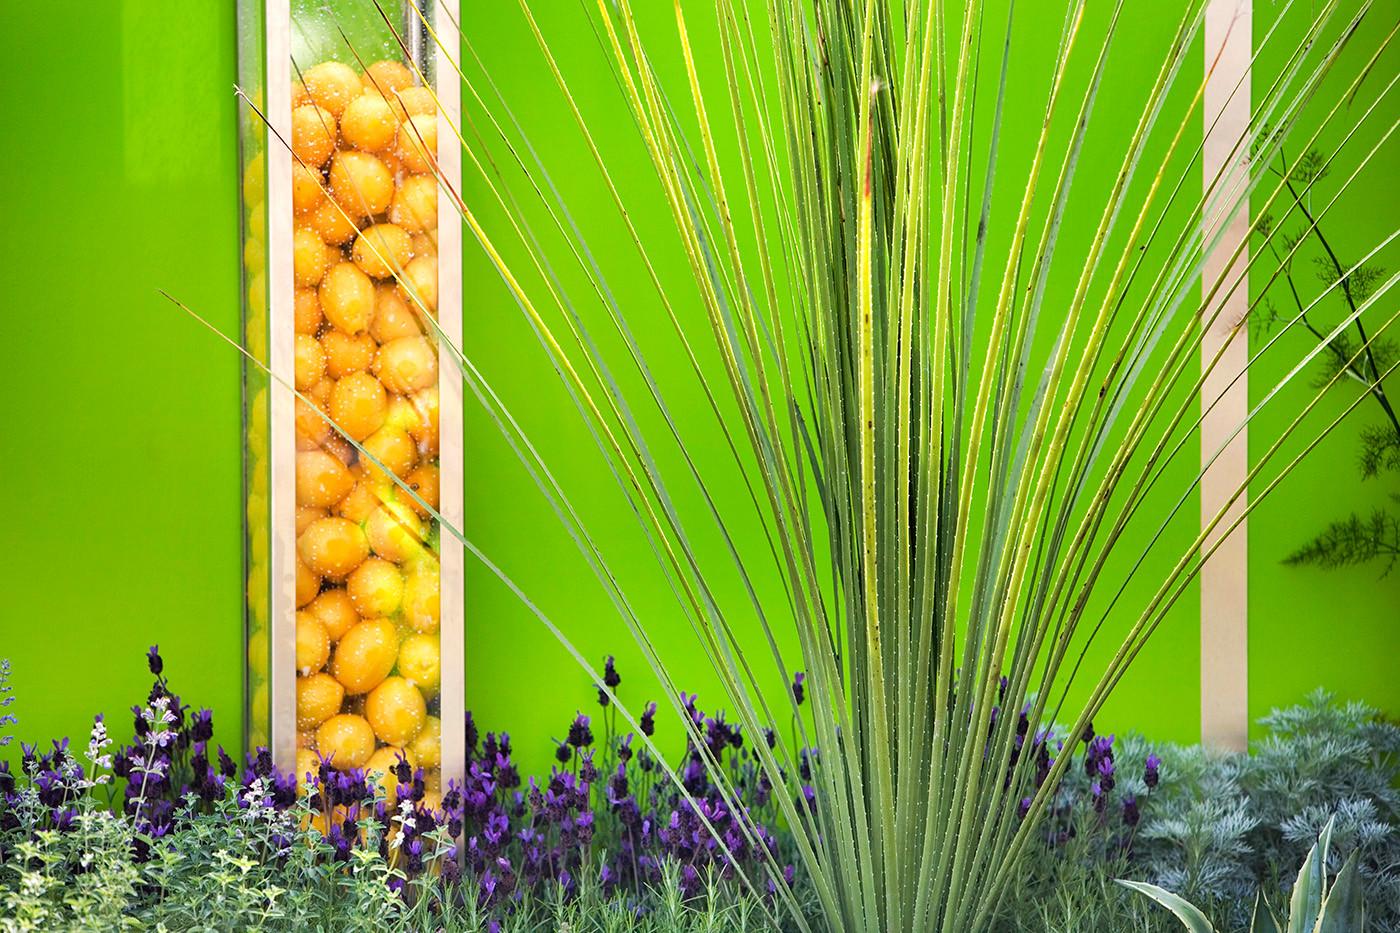 Lemons and lavender